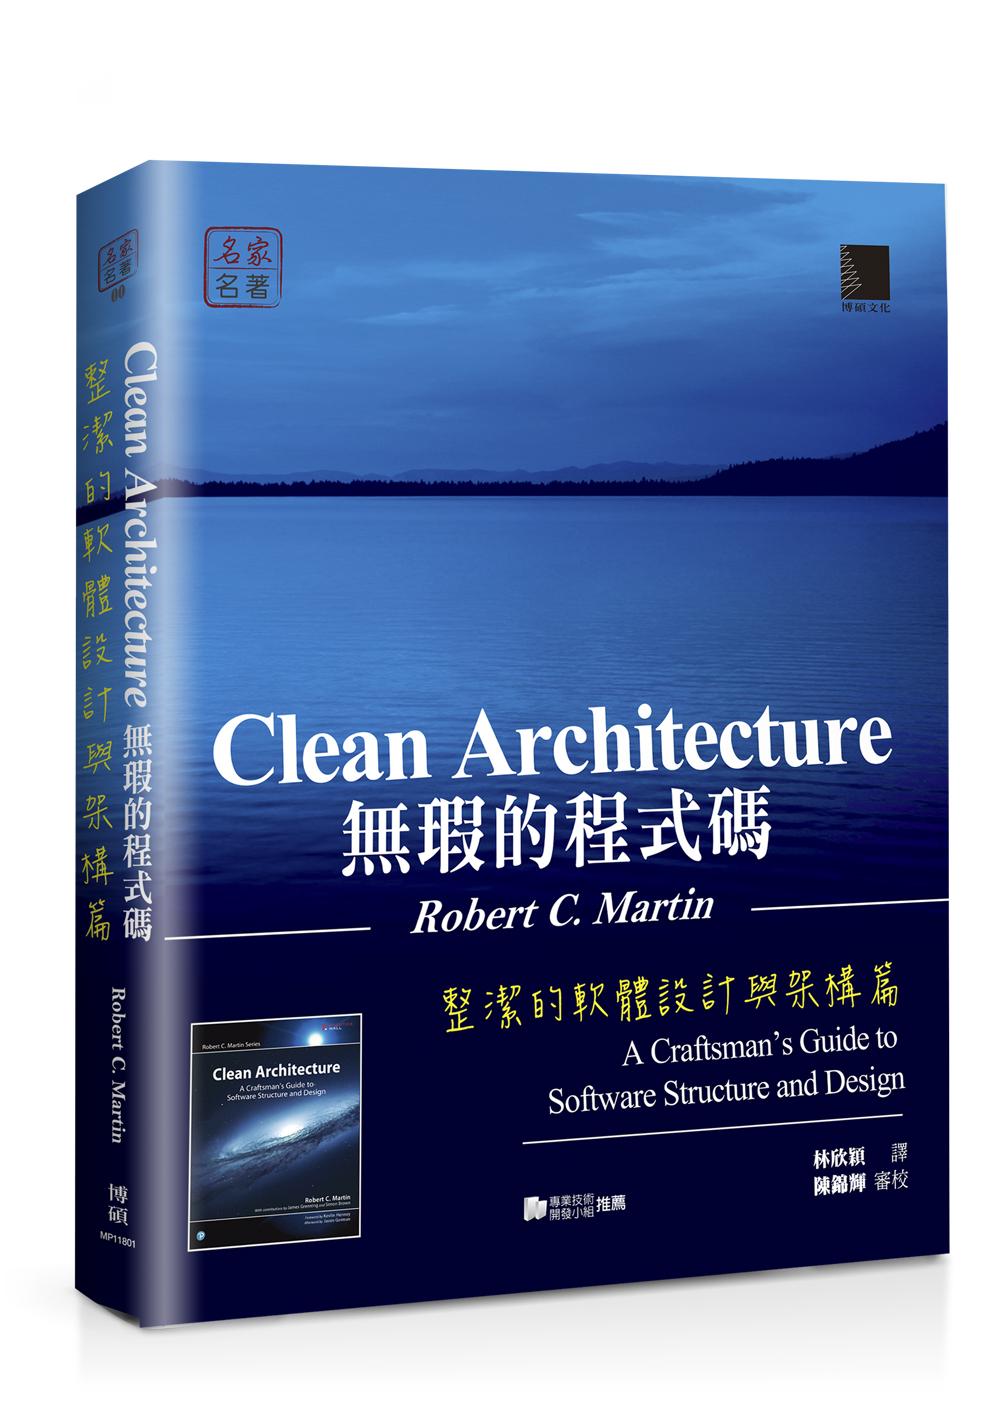 天瓏網路書店-無瑕的程式碼-整潔的軟體設計與架構篇 (Clean Architecture: A Craftsman's Guide to Software Structure and Design)